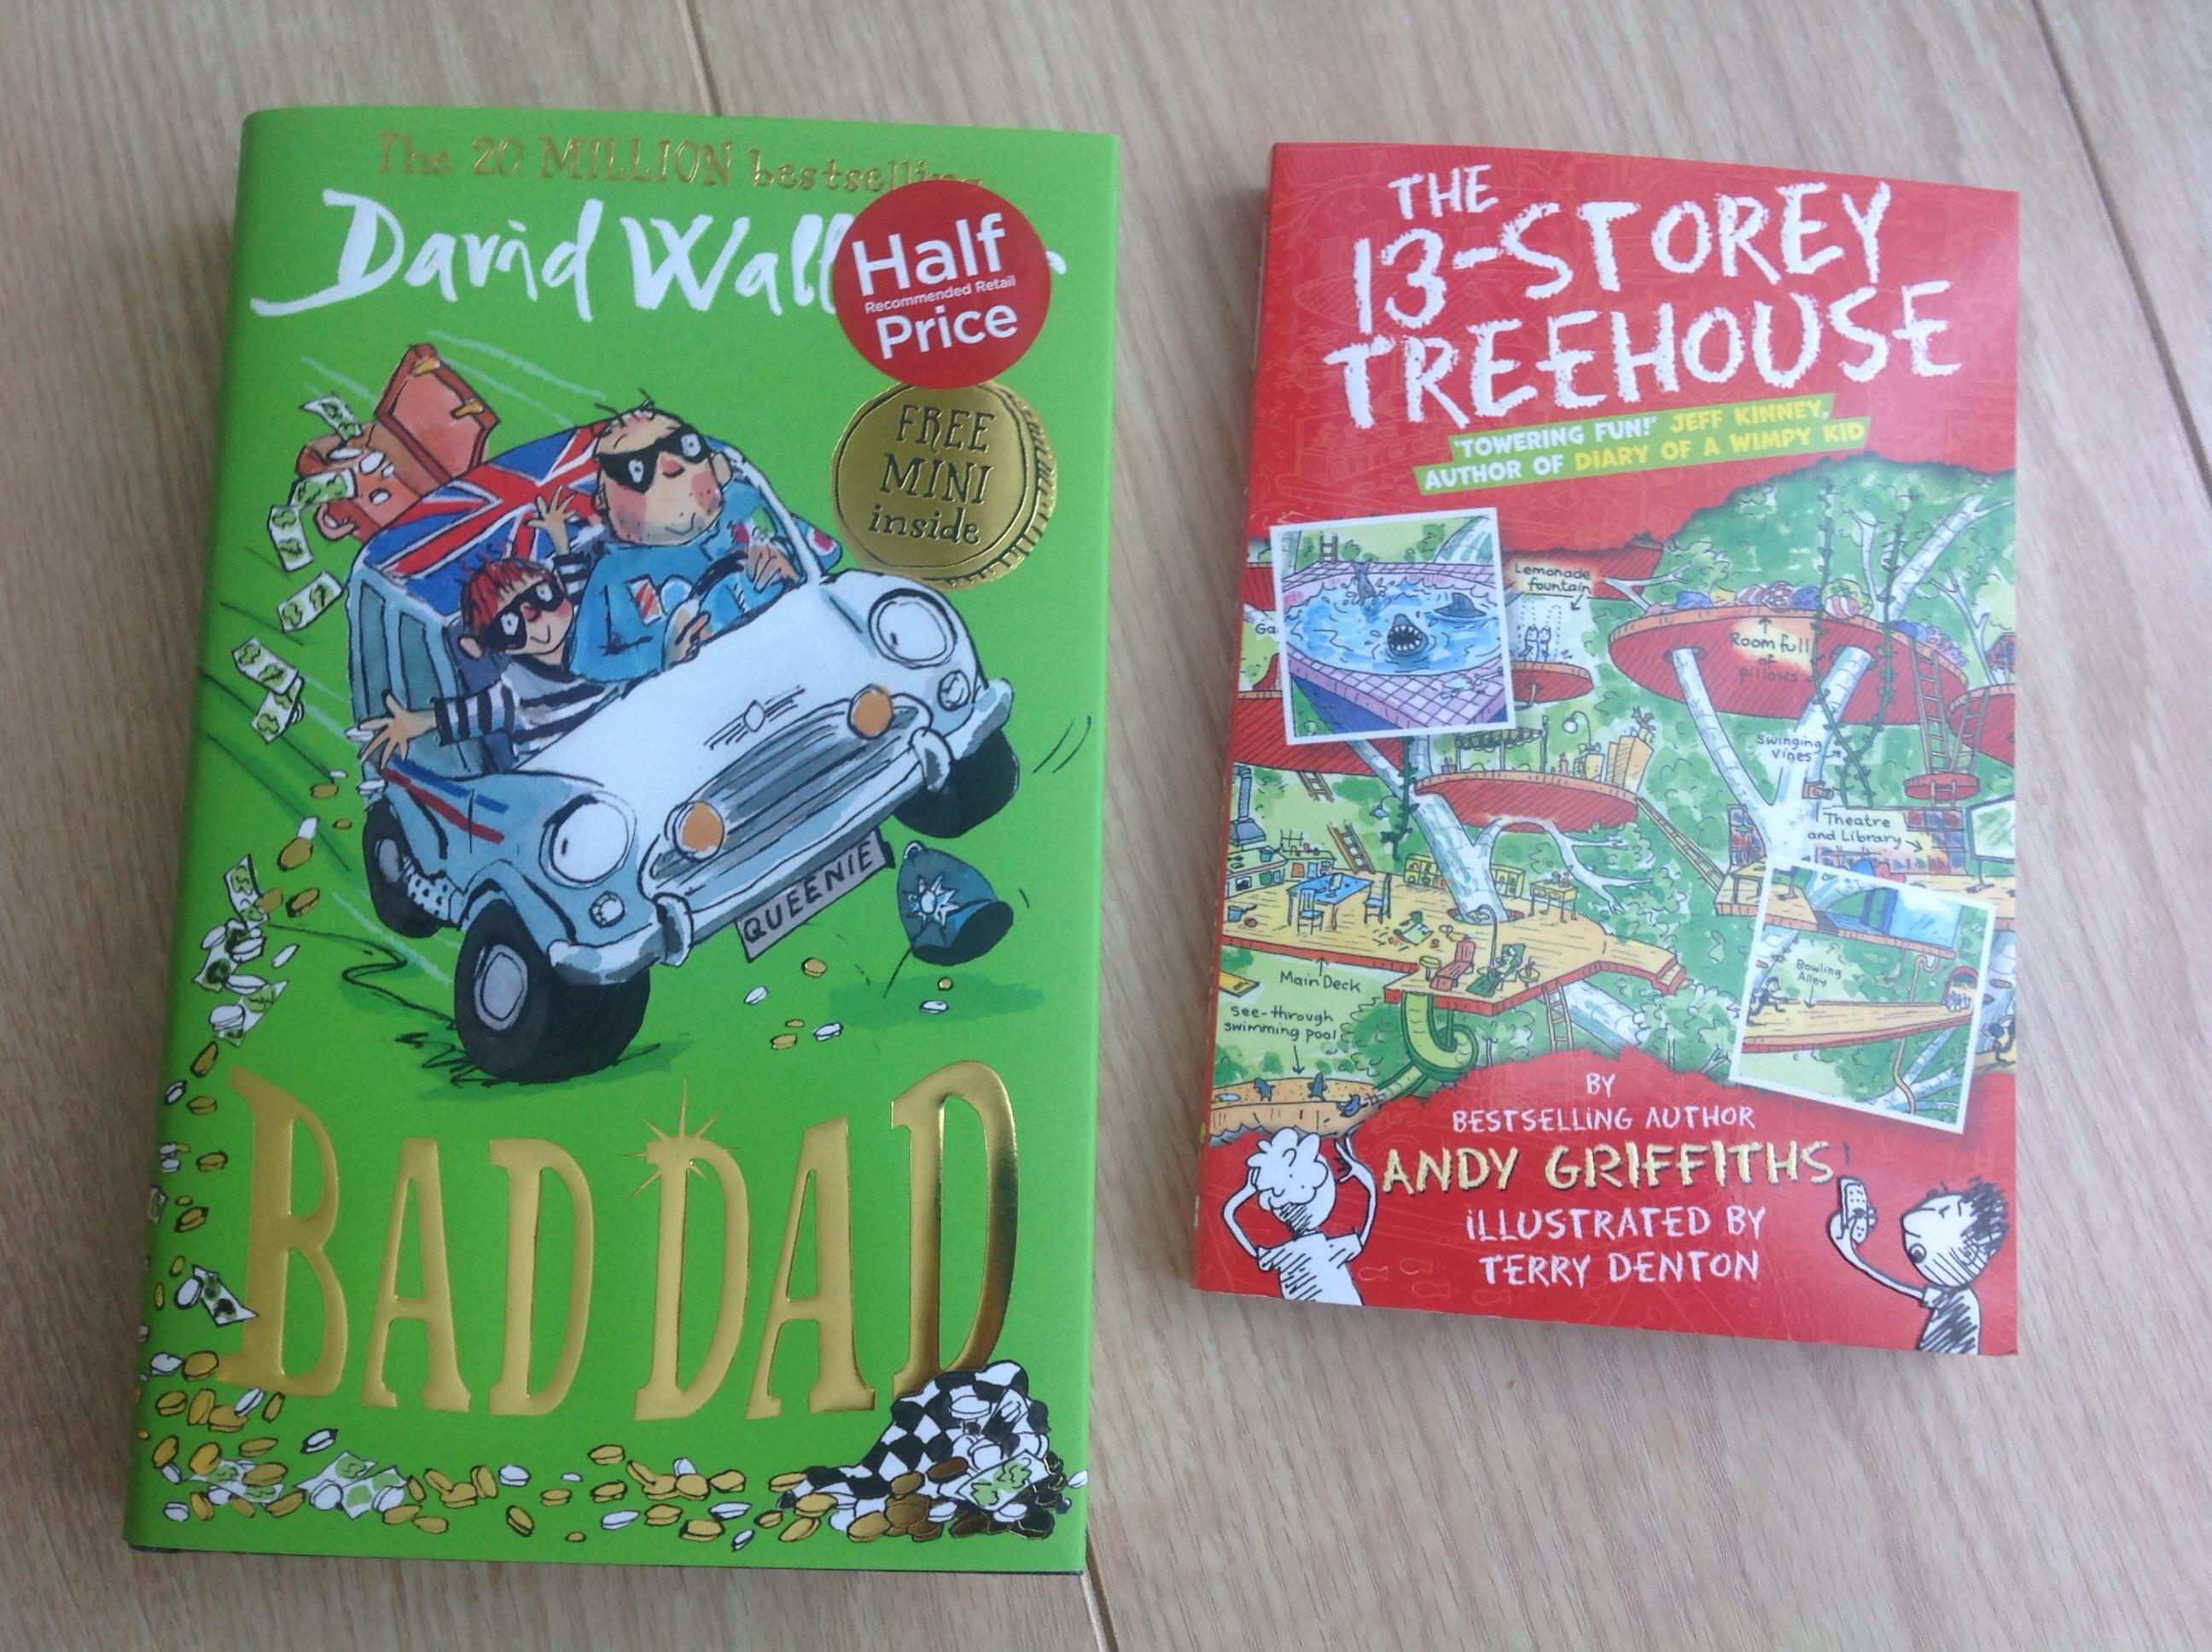 WHSmith David Walliams Bad Dad half price £6.49  and free book